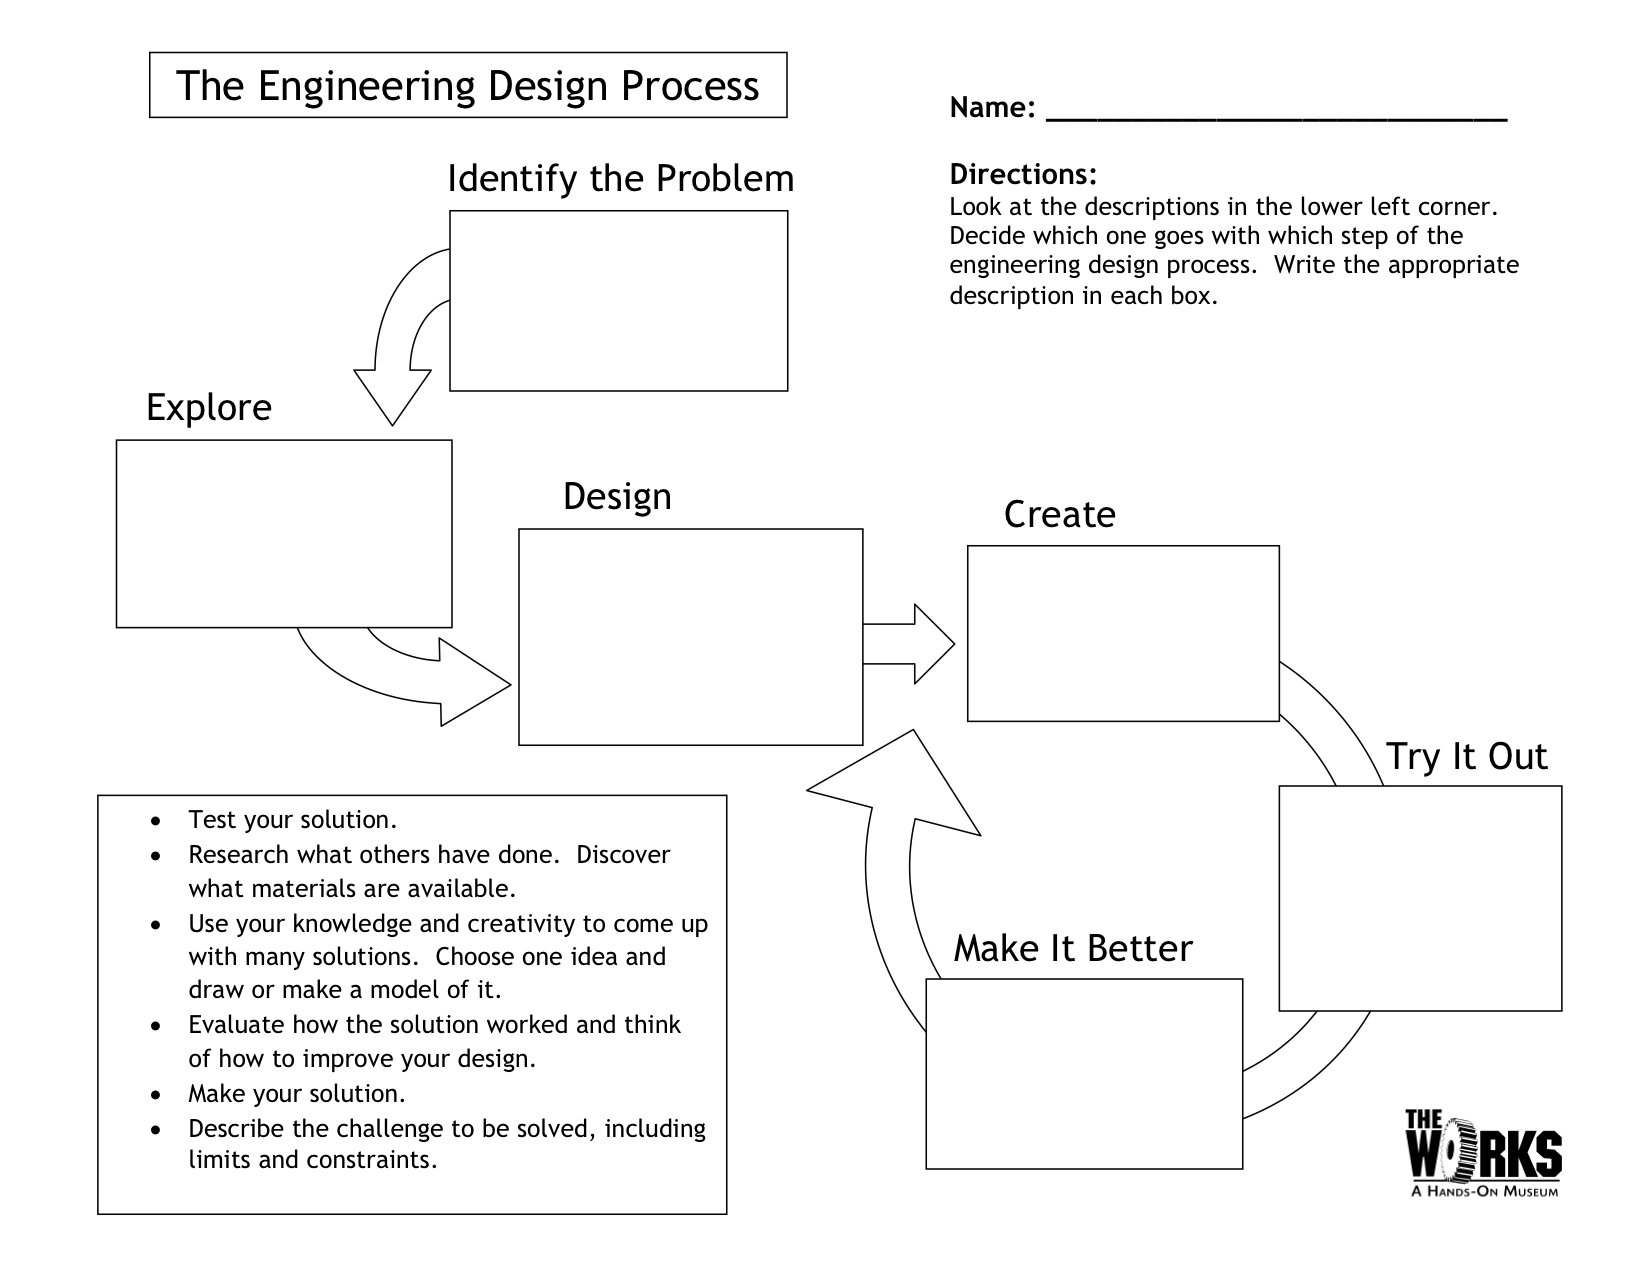 Engineering Design Process Worksheet  Yooob Inside Engineering Design Process Worksheet Pdf